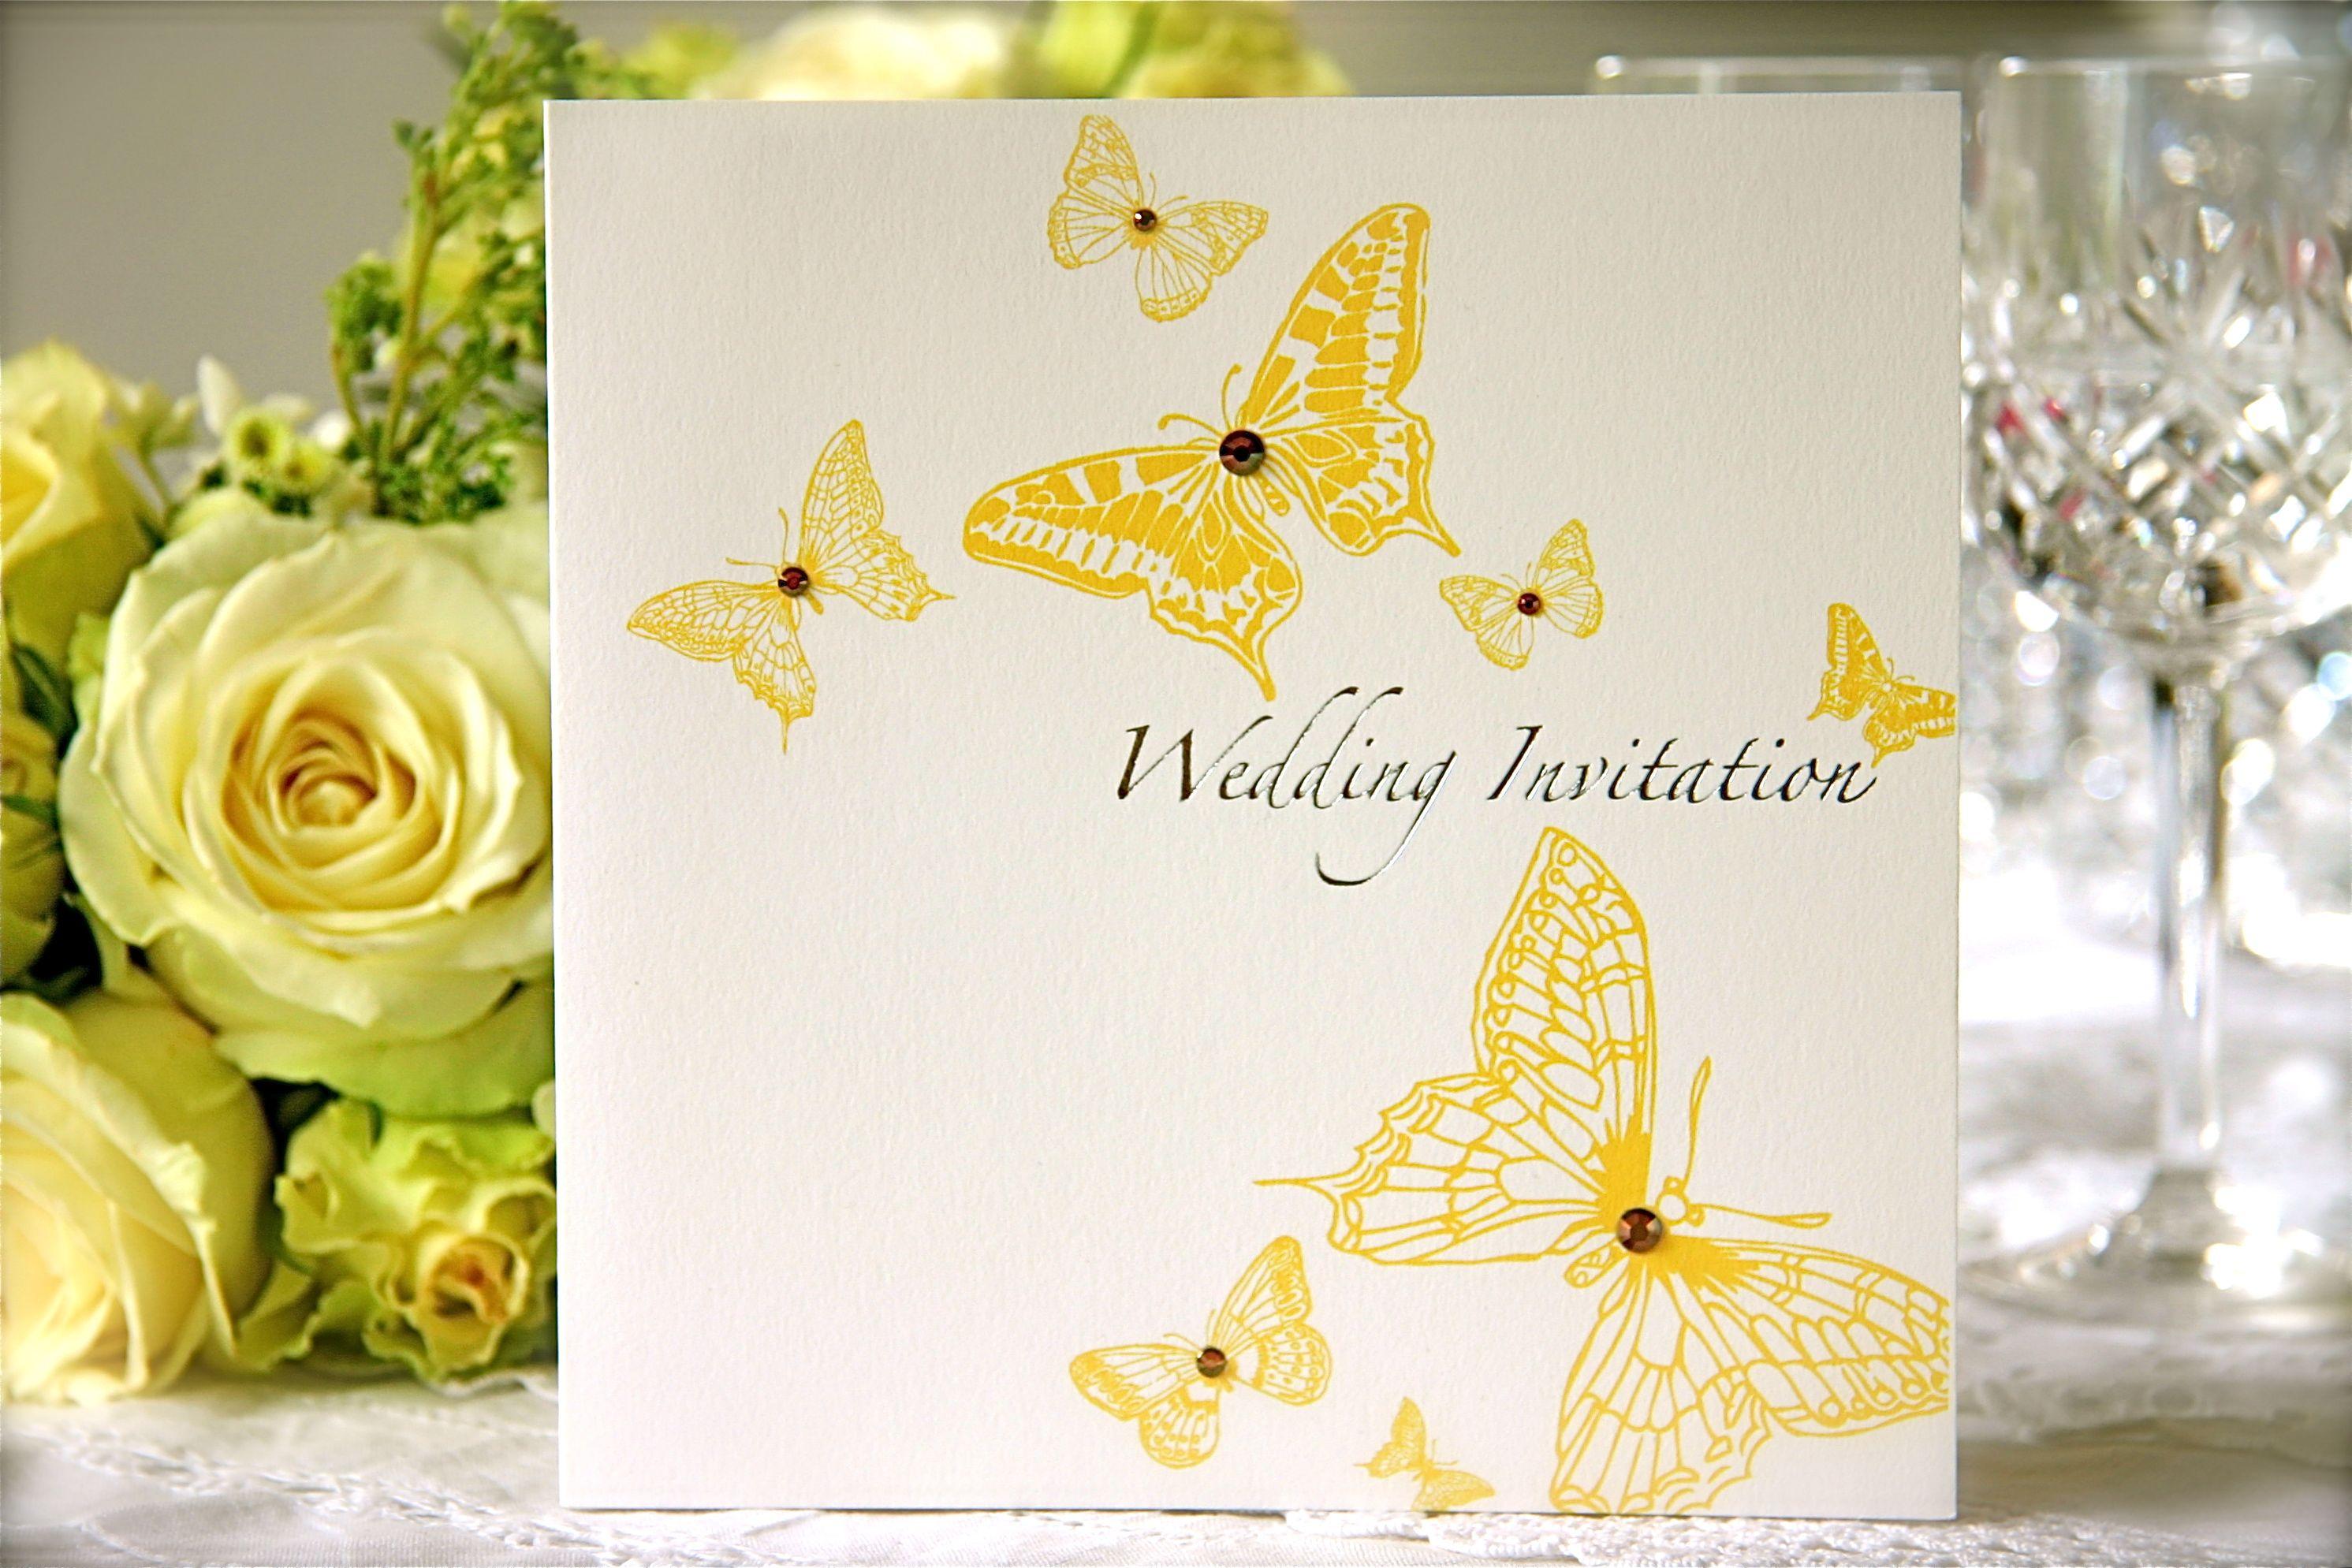 Pin by carriewedding on weddings pinterest yellow wedding